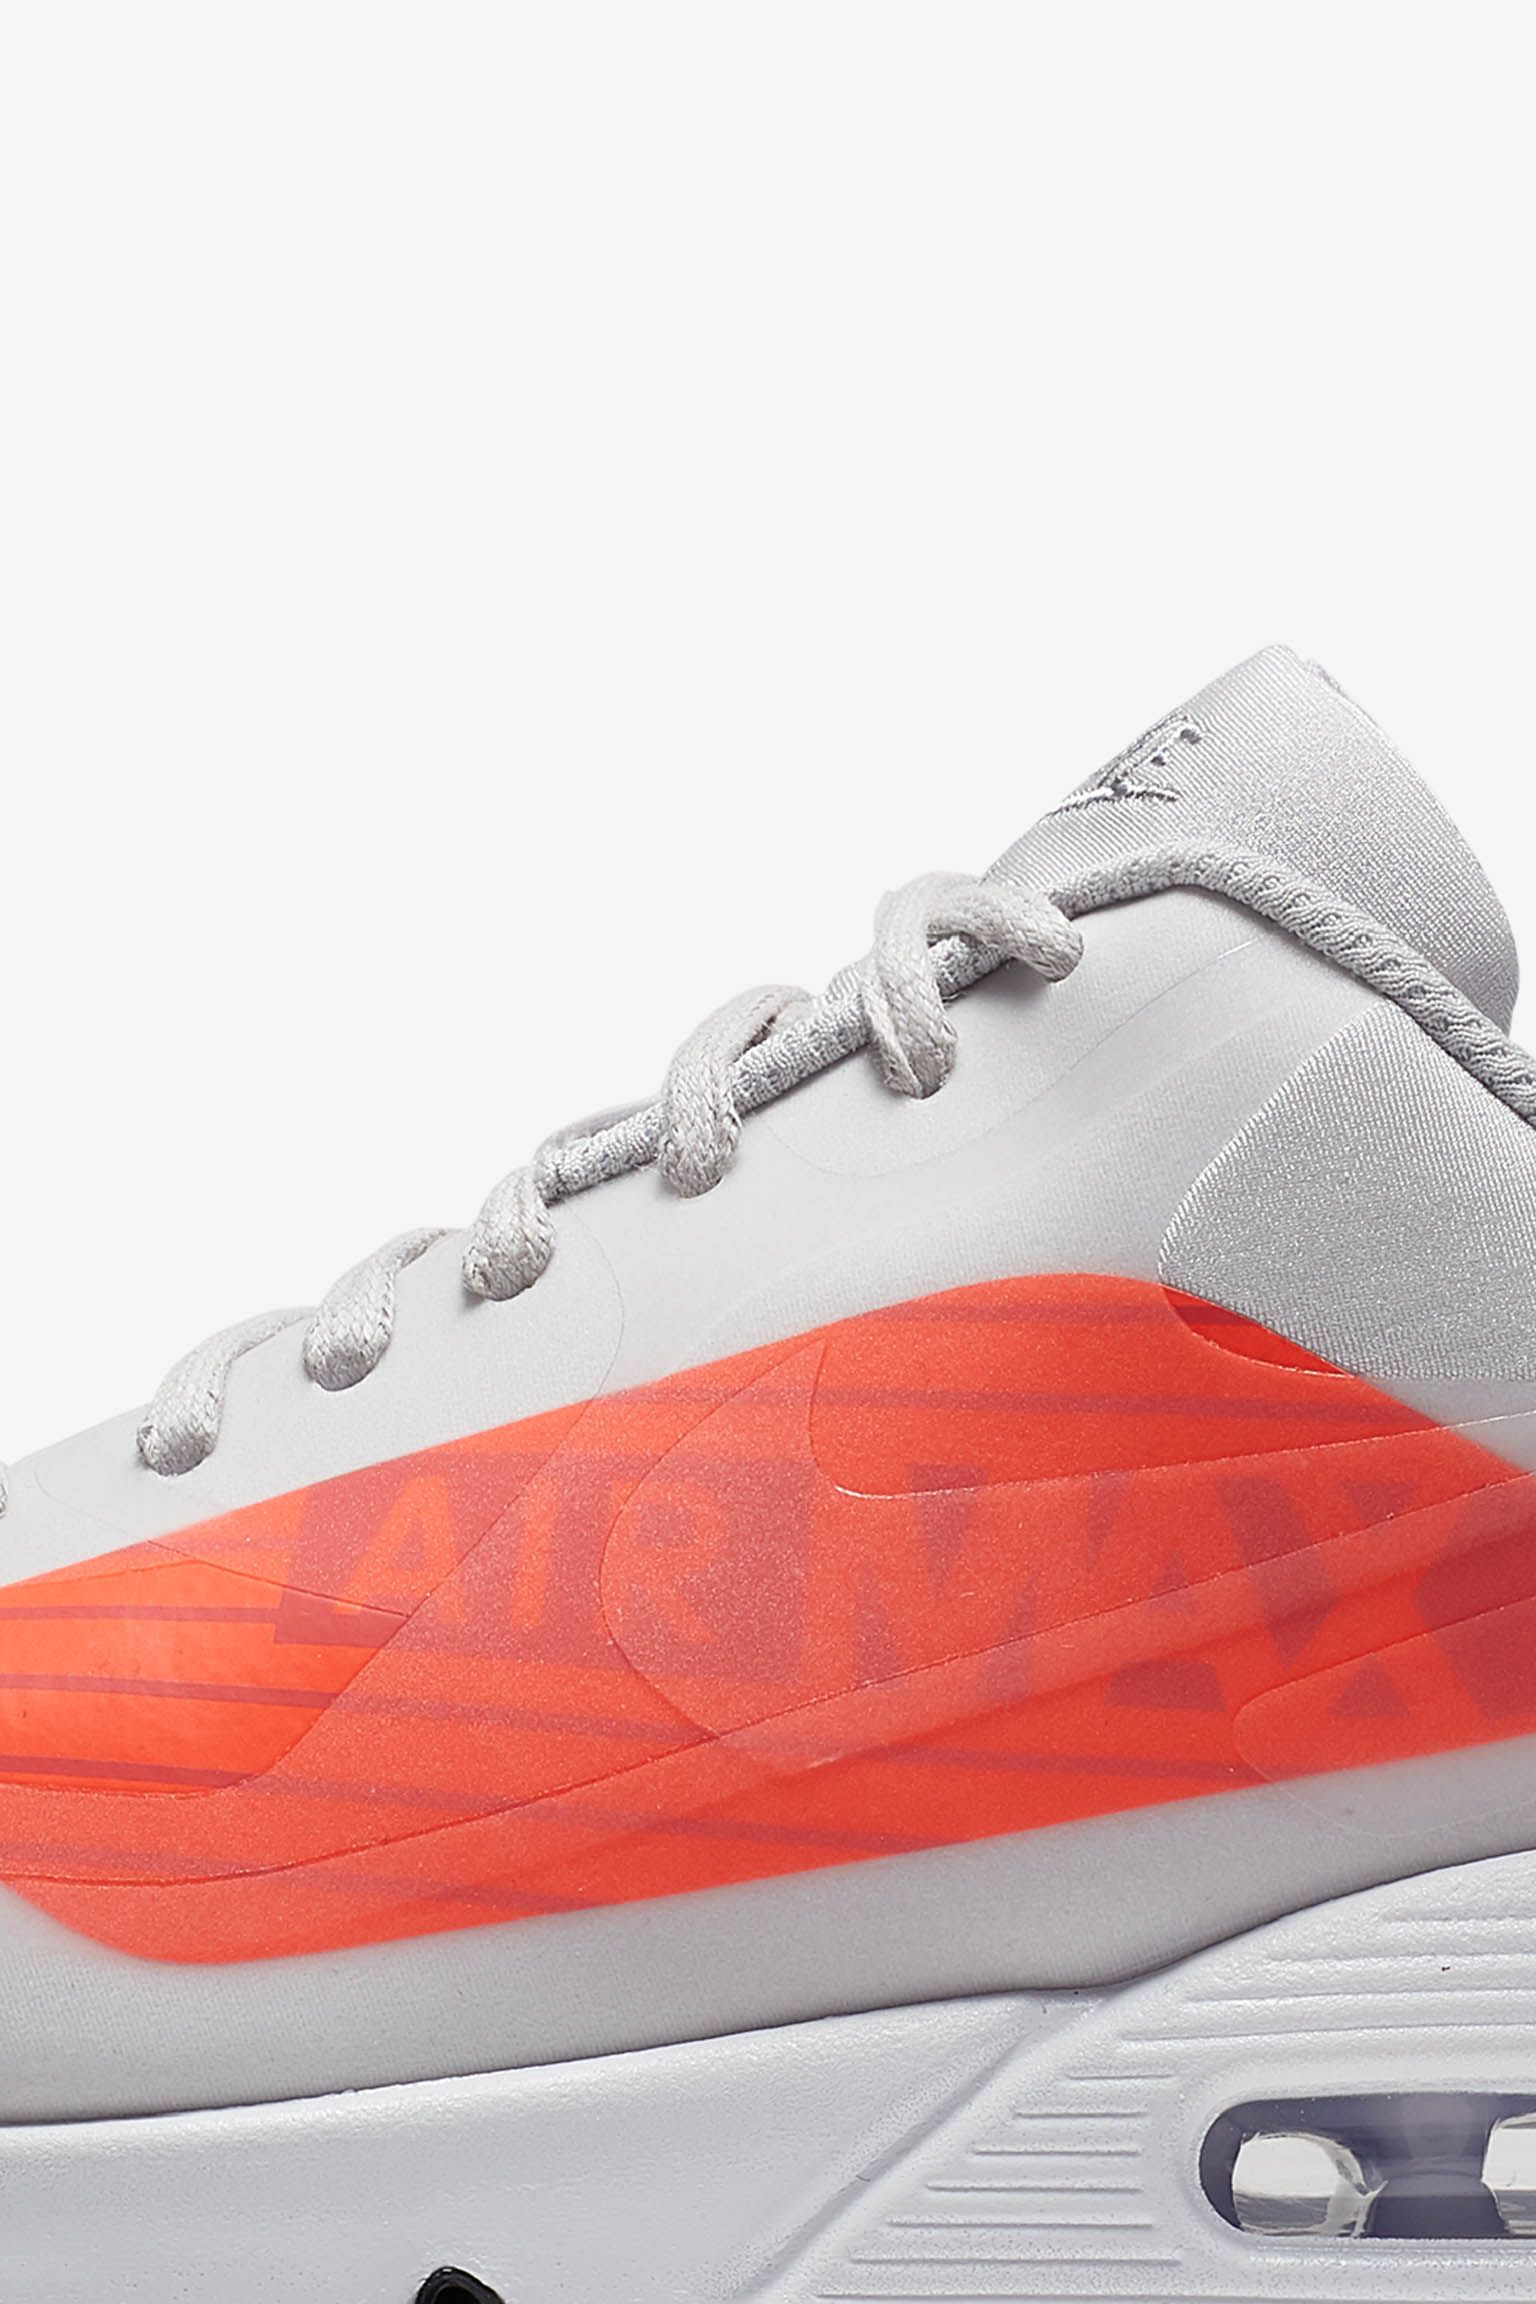 Nike Air Max 90 Big Logo 'Neutral Grey & Light Crimson' Release Date